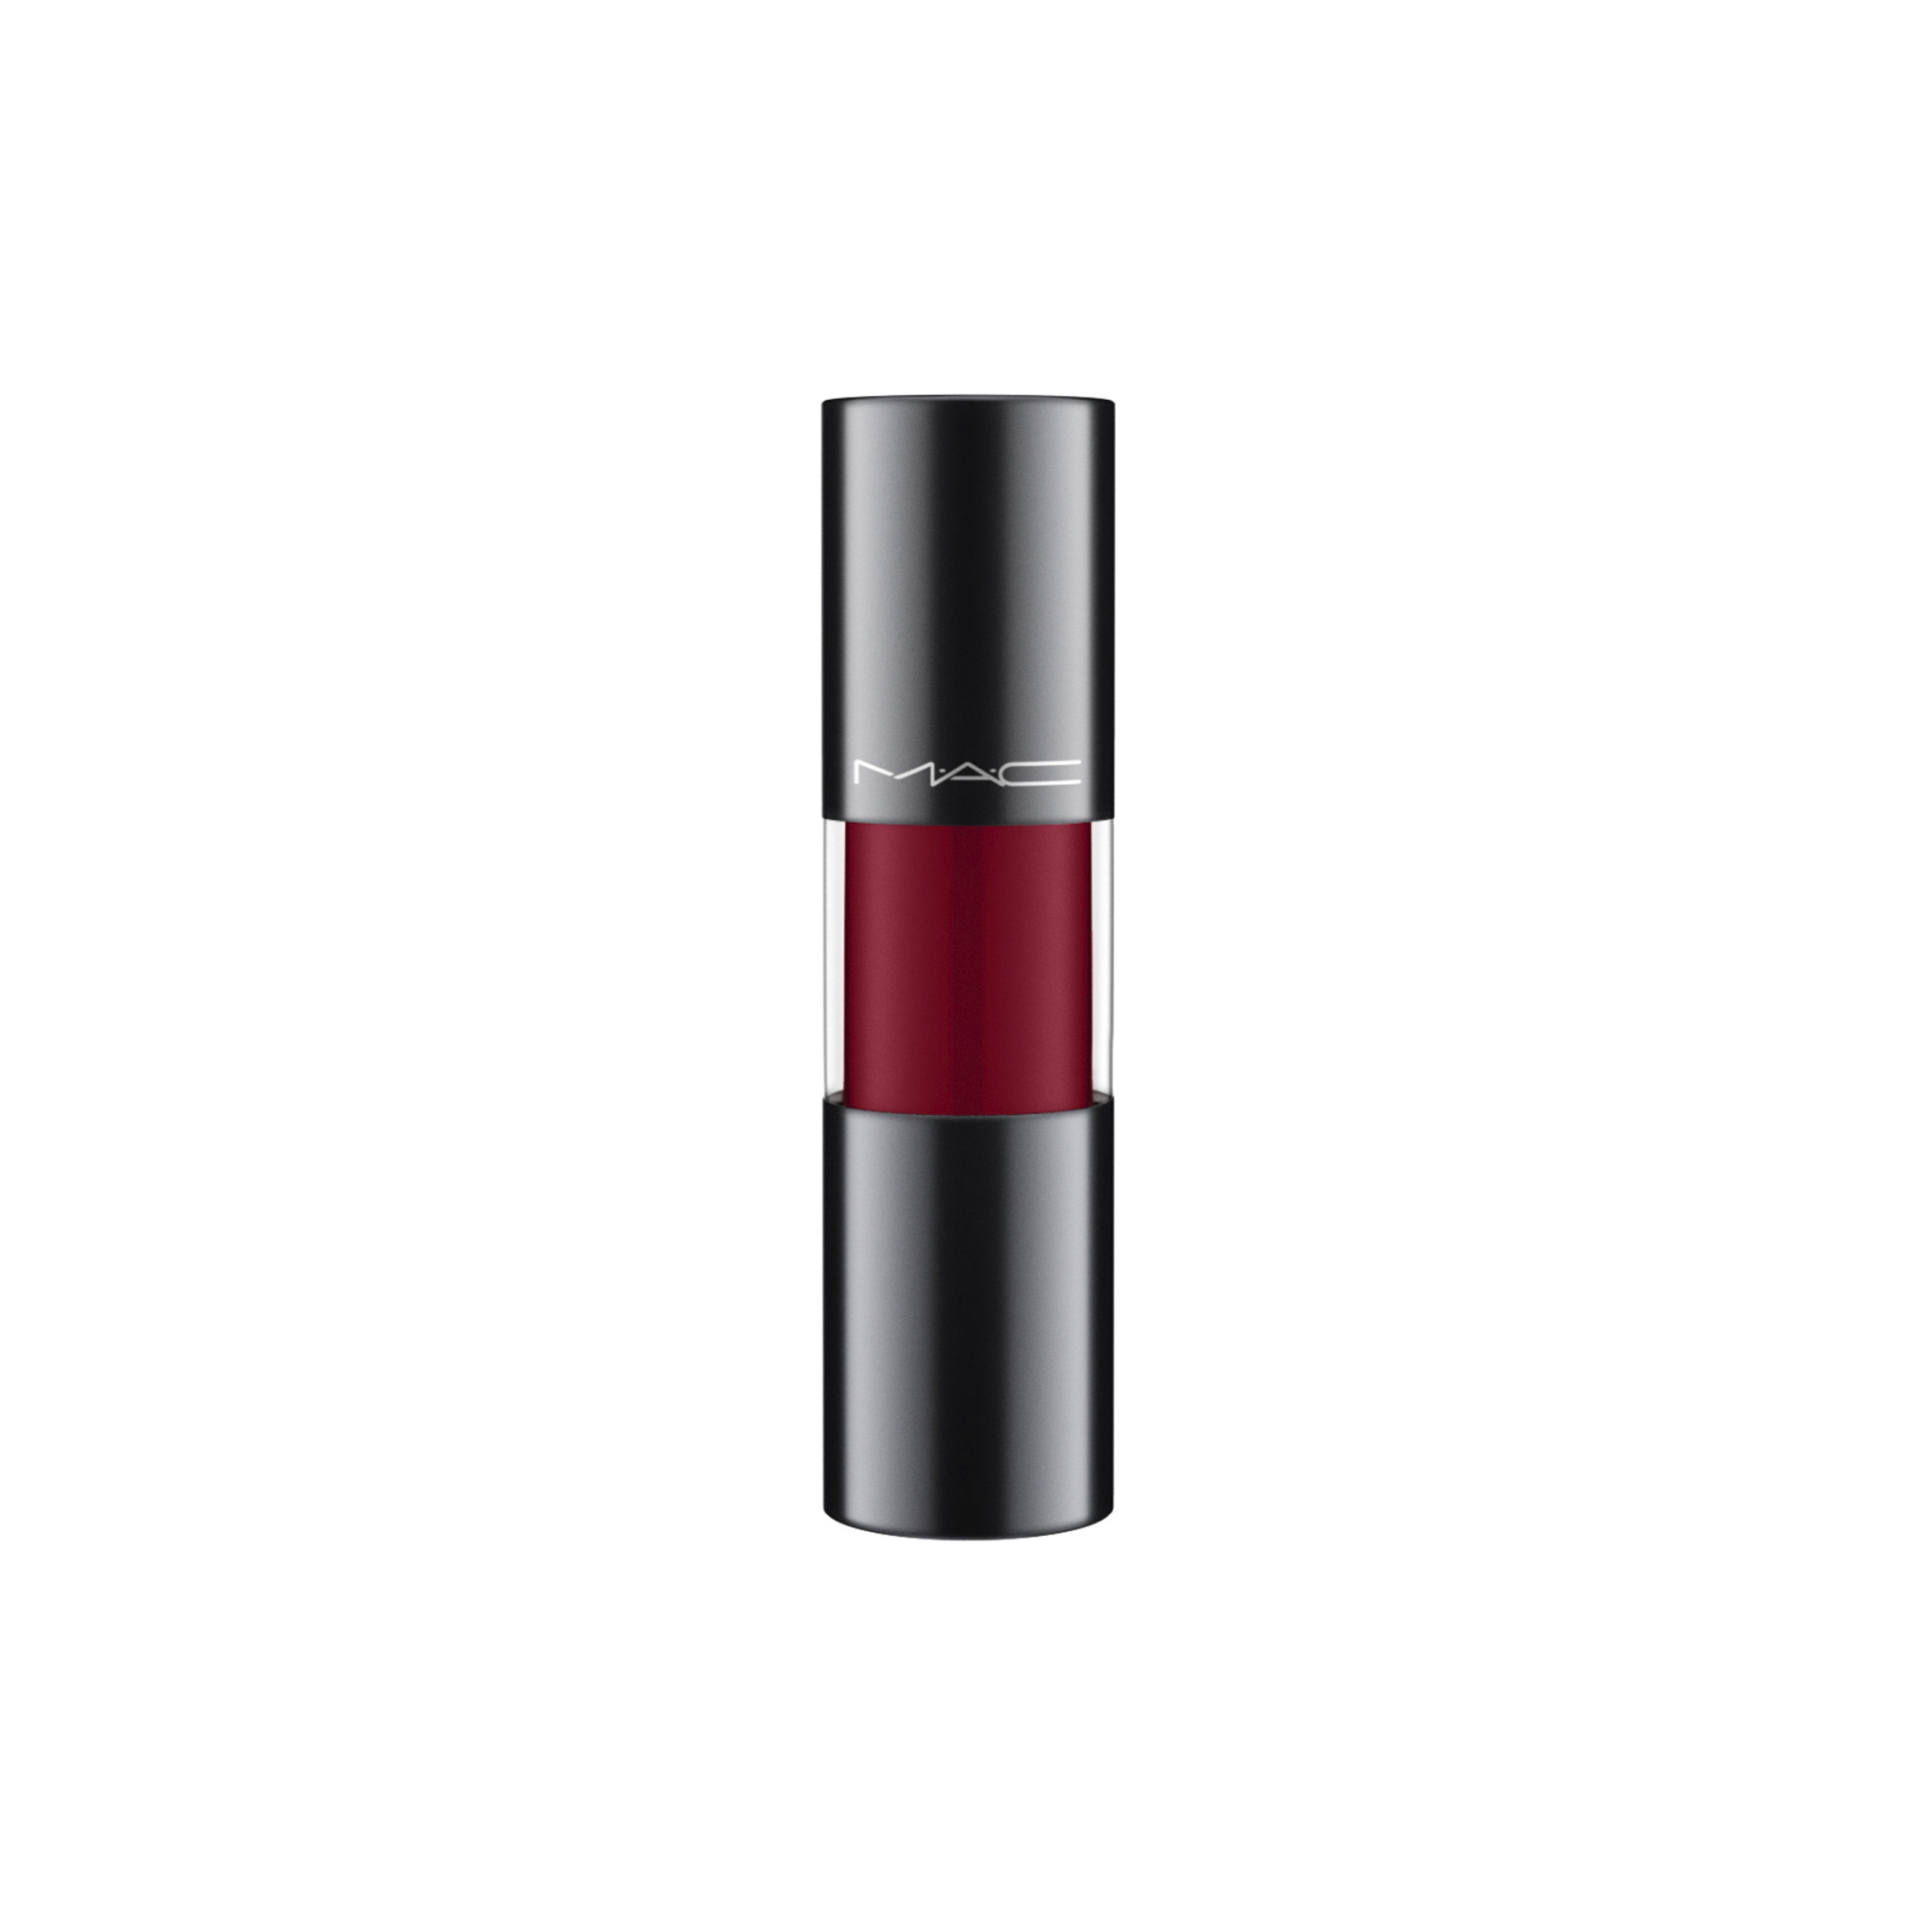 MAC Versicolour Varnish Cream Lip Stain, serial stain